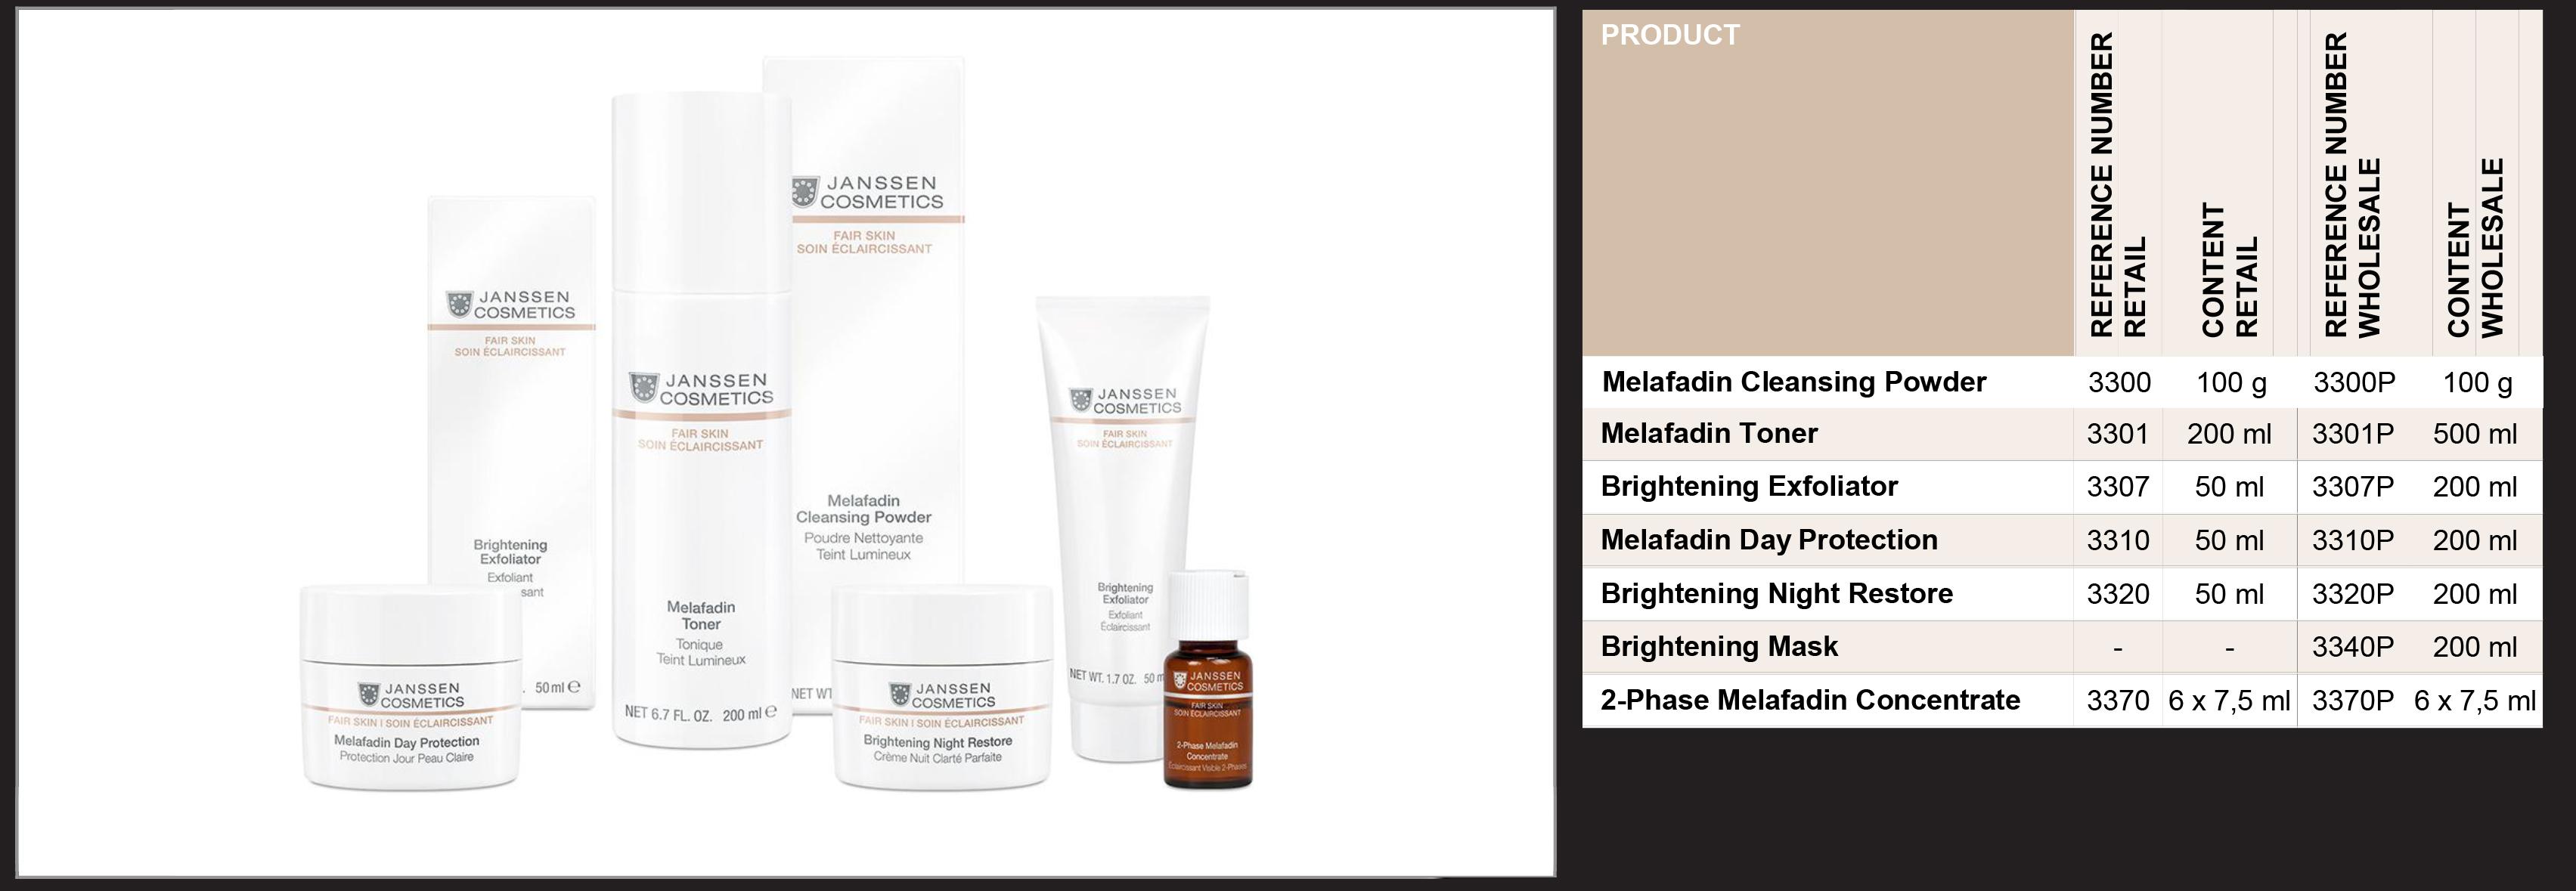 Lifestyle Aesthetics_Janssen Cosmetics (4)